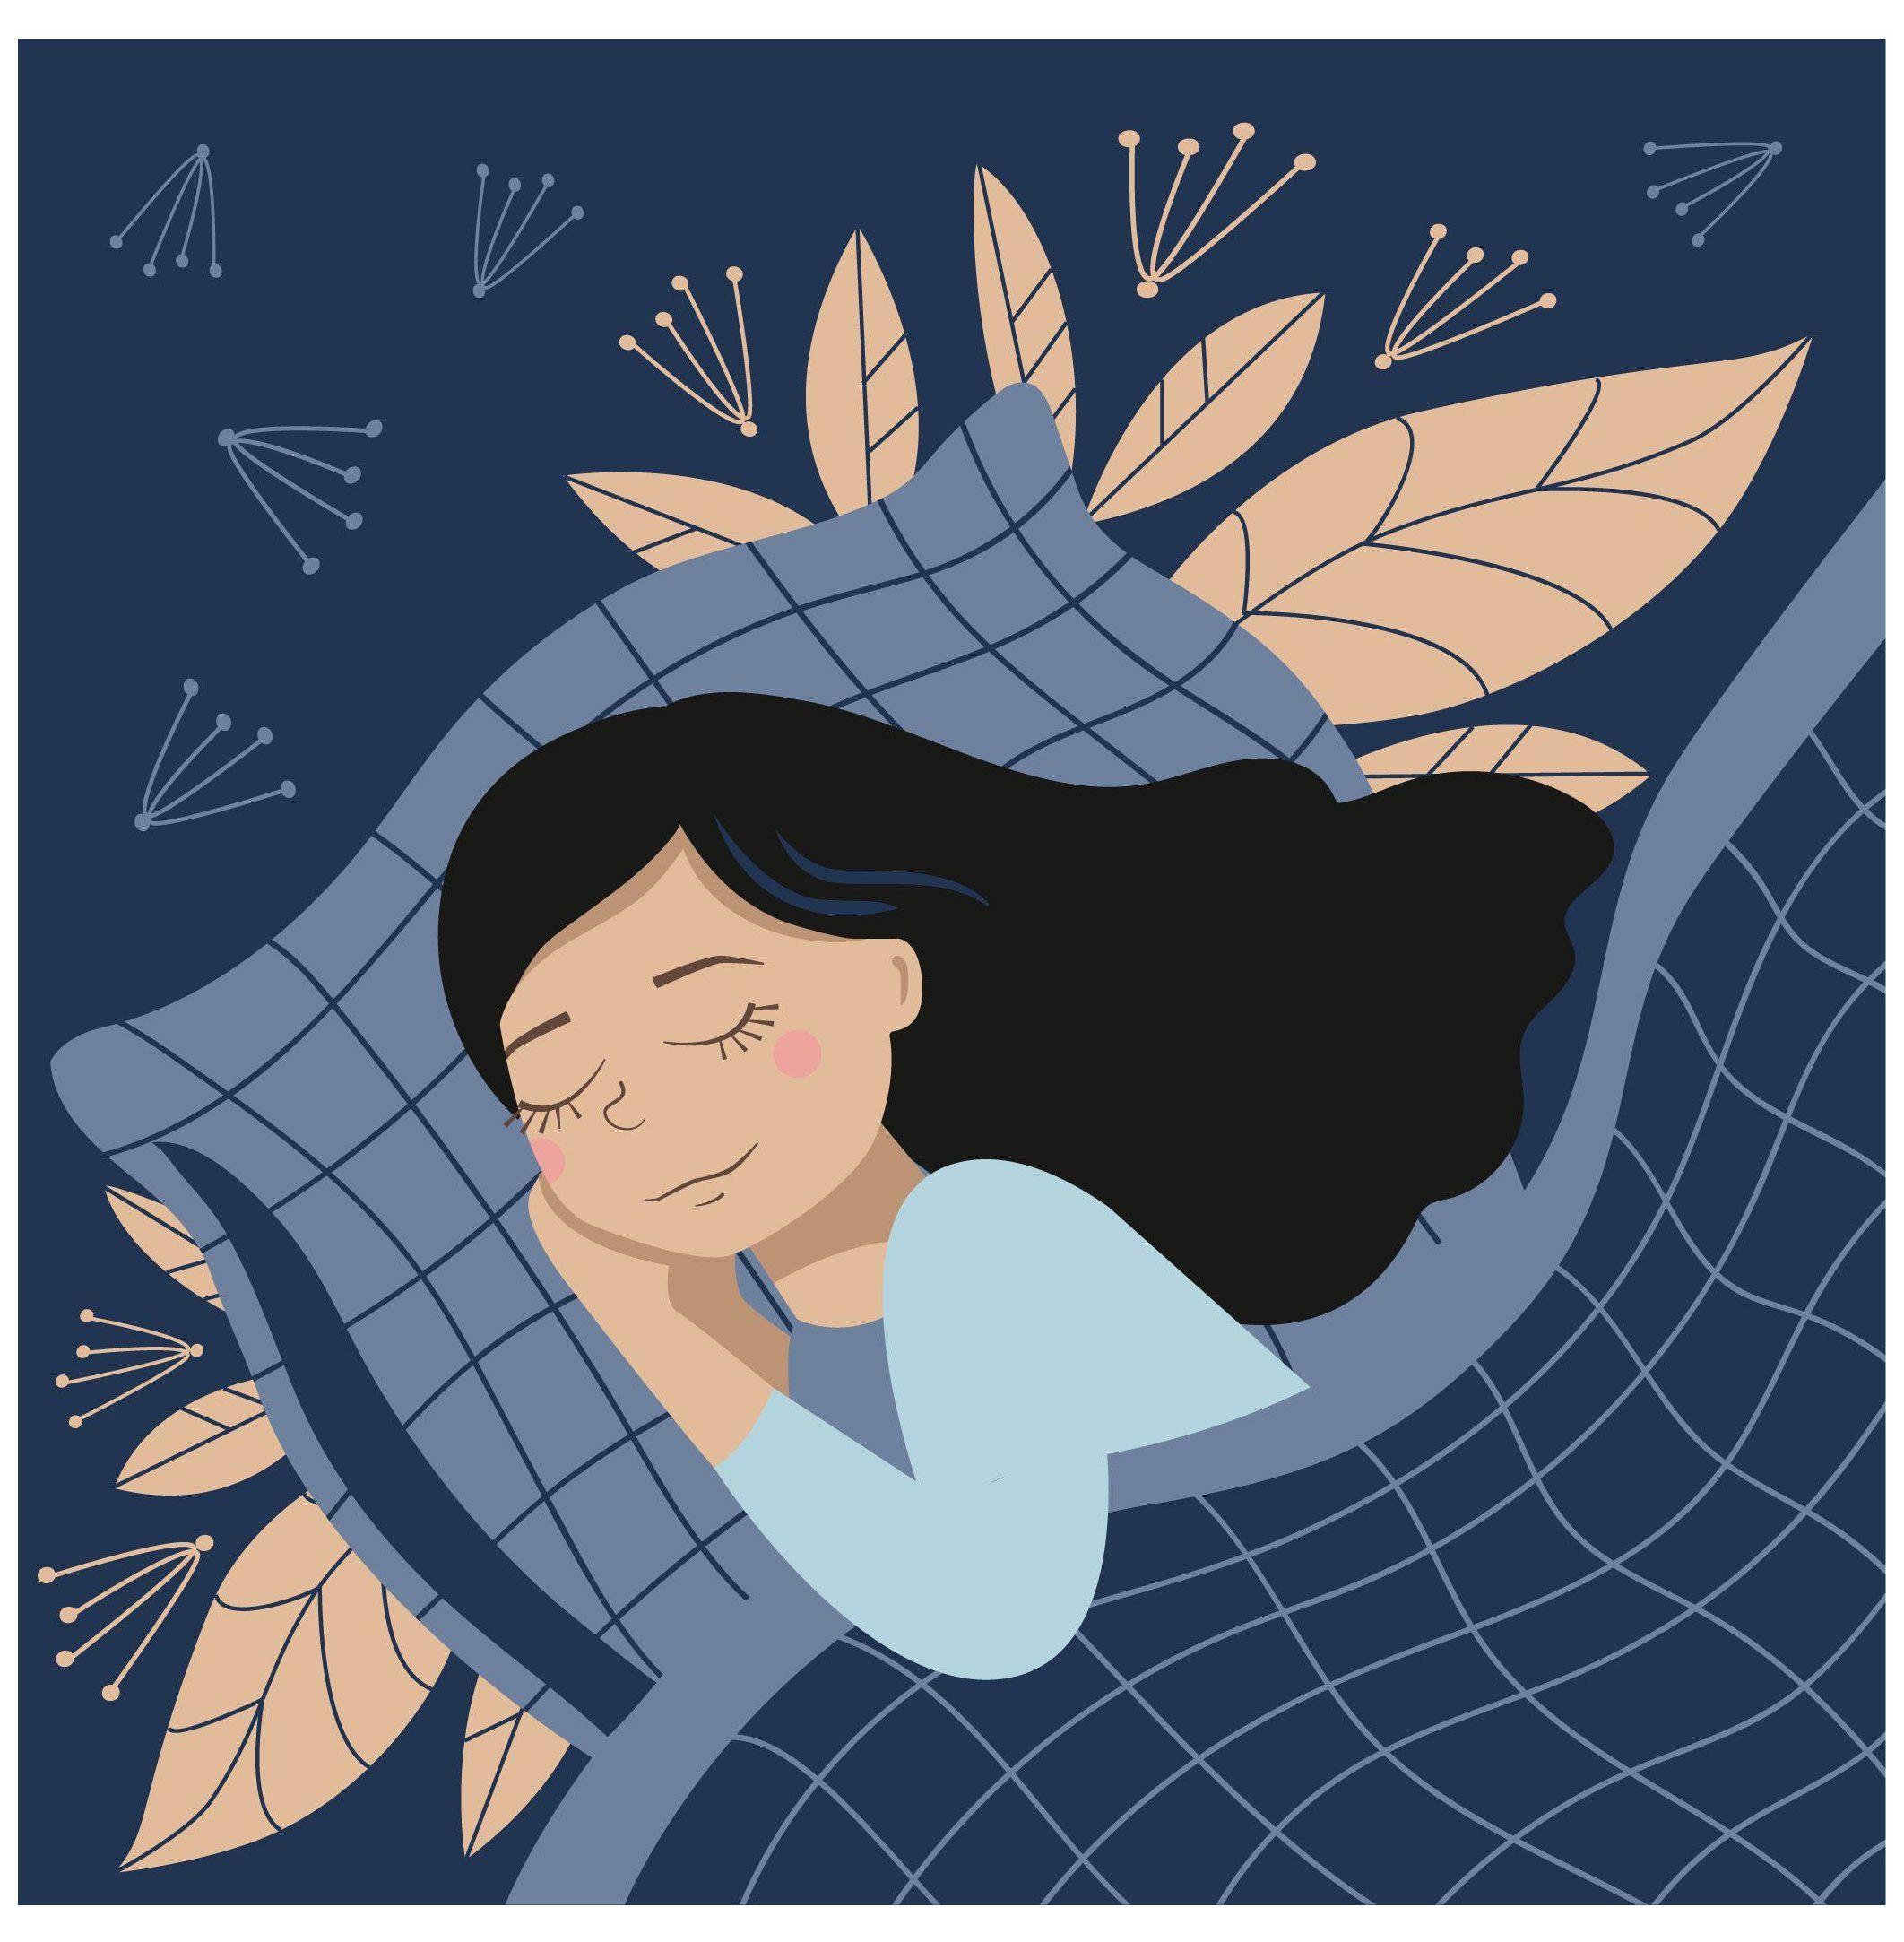 Sleeping Girl Illustration Dreams Sleepinggirlillustrationdreams In 2021 Dream Illustration Sleeping Drawing Illustration